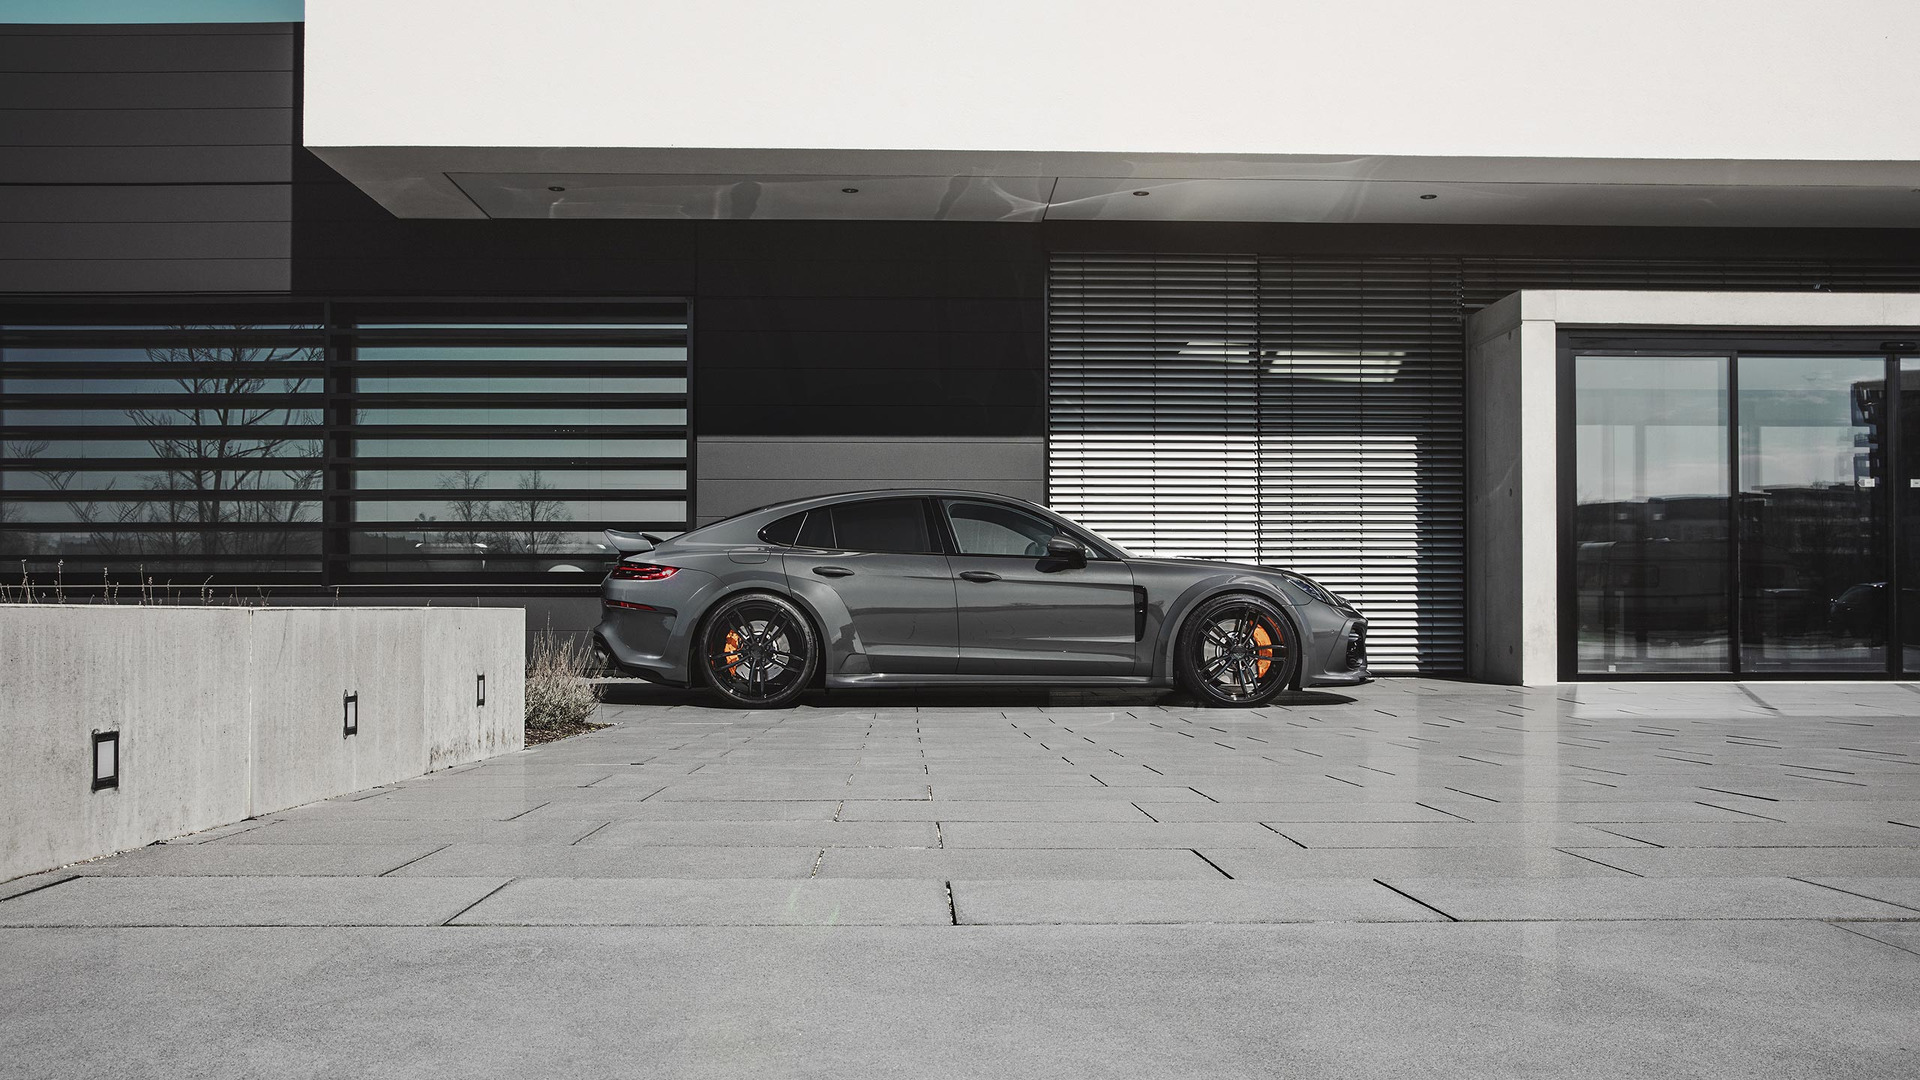 Techart_GrandGT_Porsche_Panamera_05